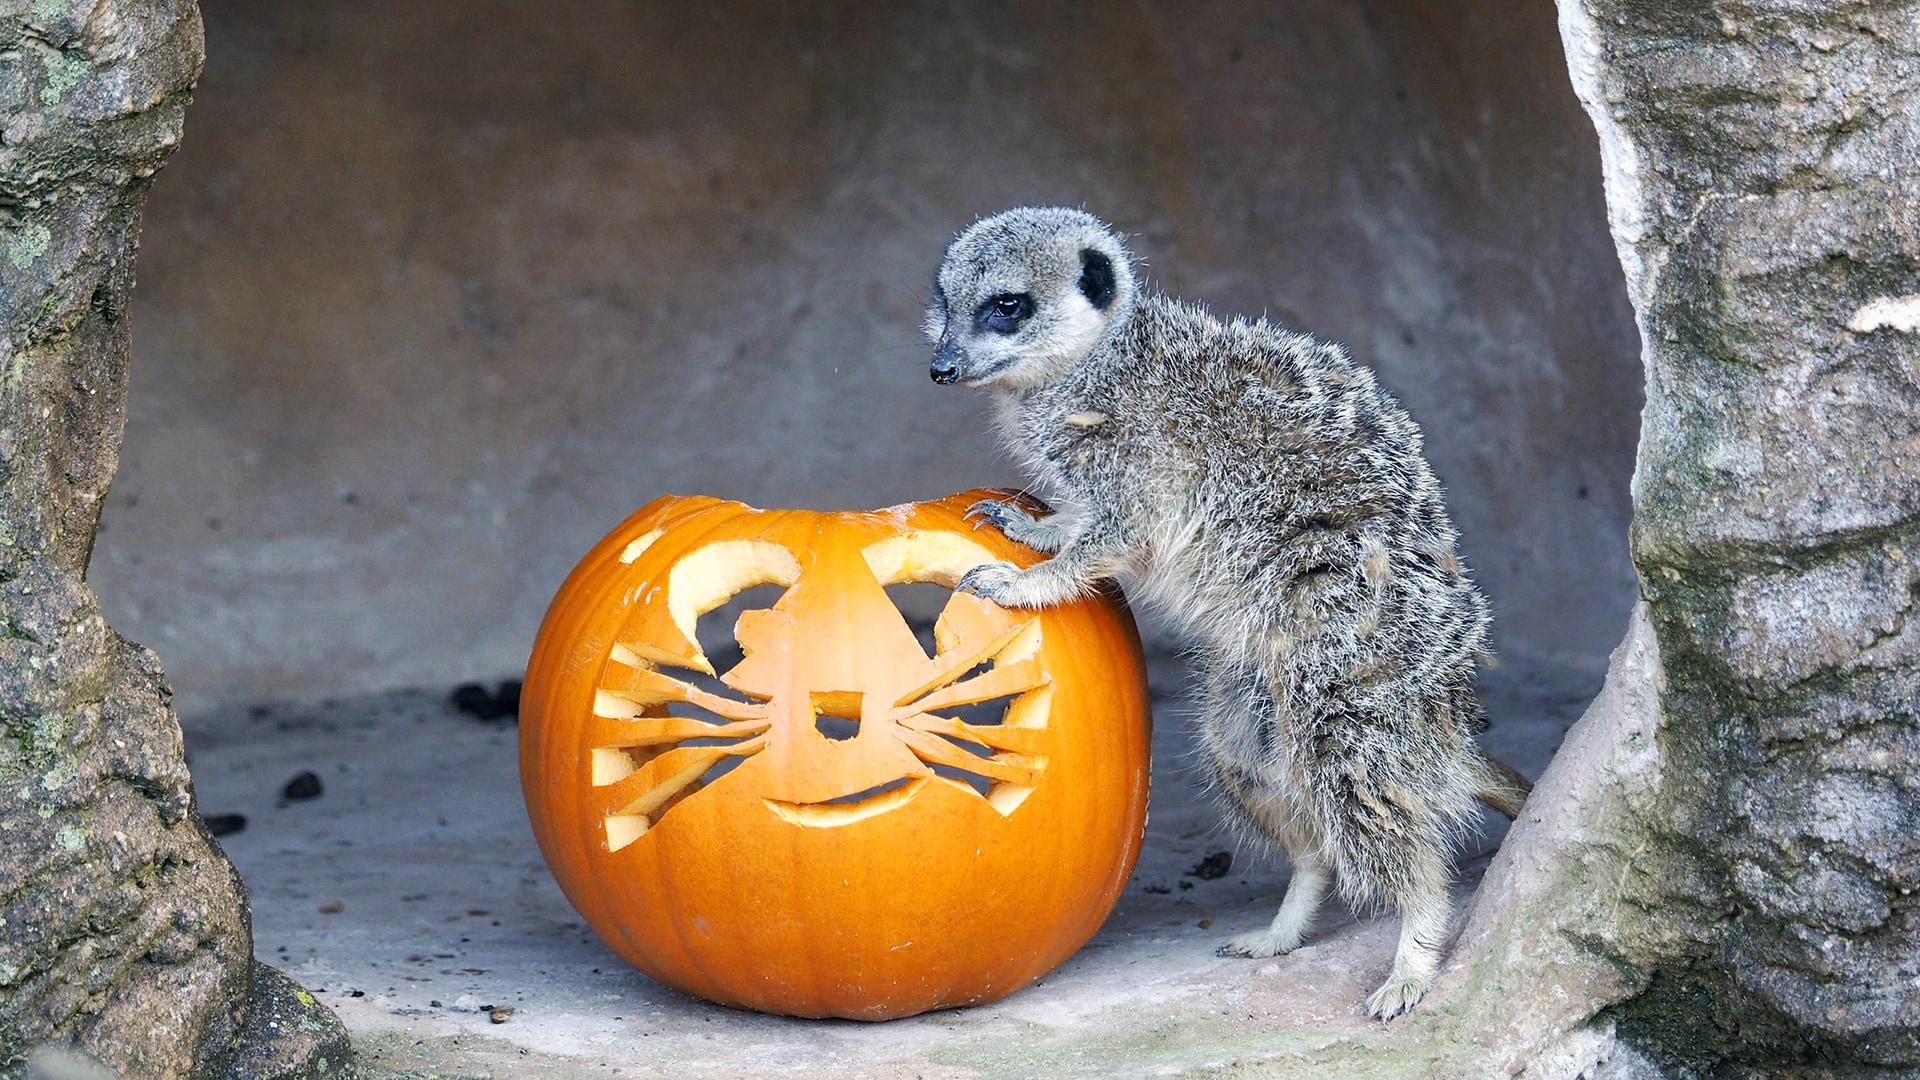 Image: Meerkats Celebrate Halloween at Whipsnade Zoo